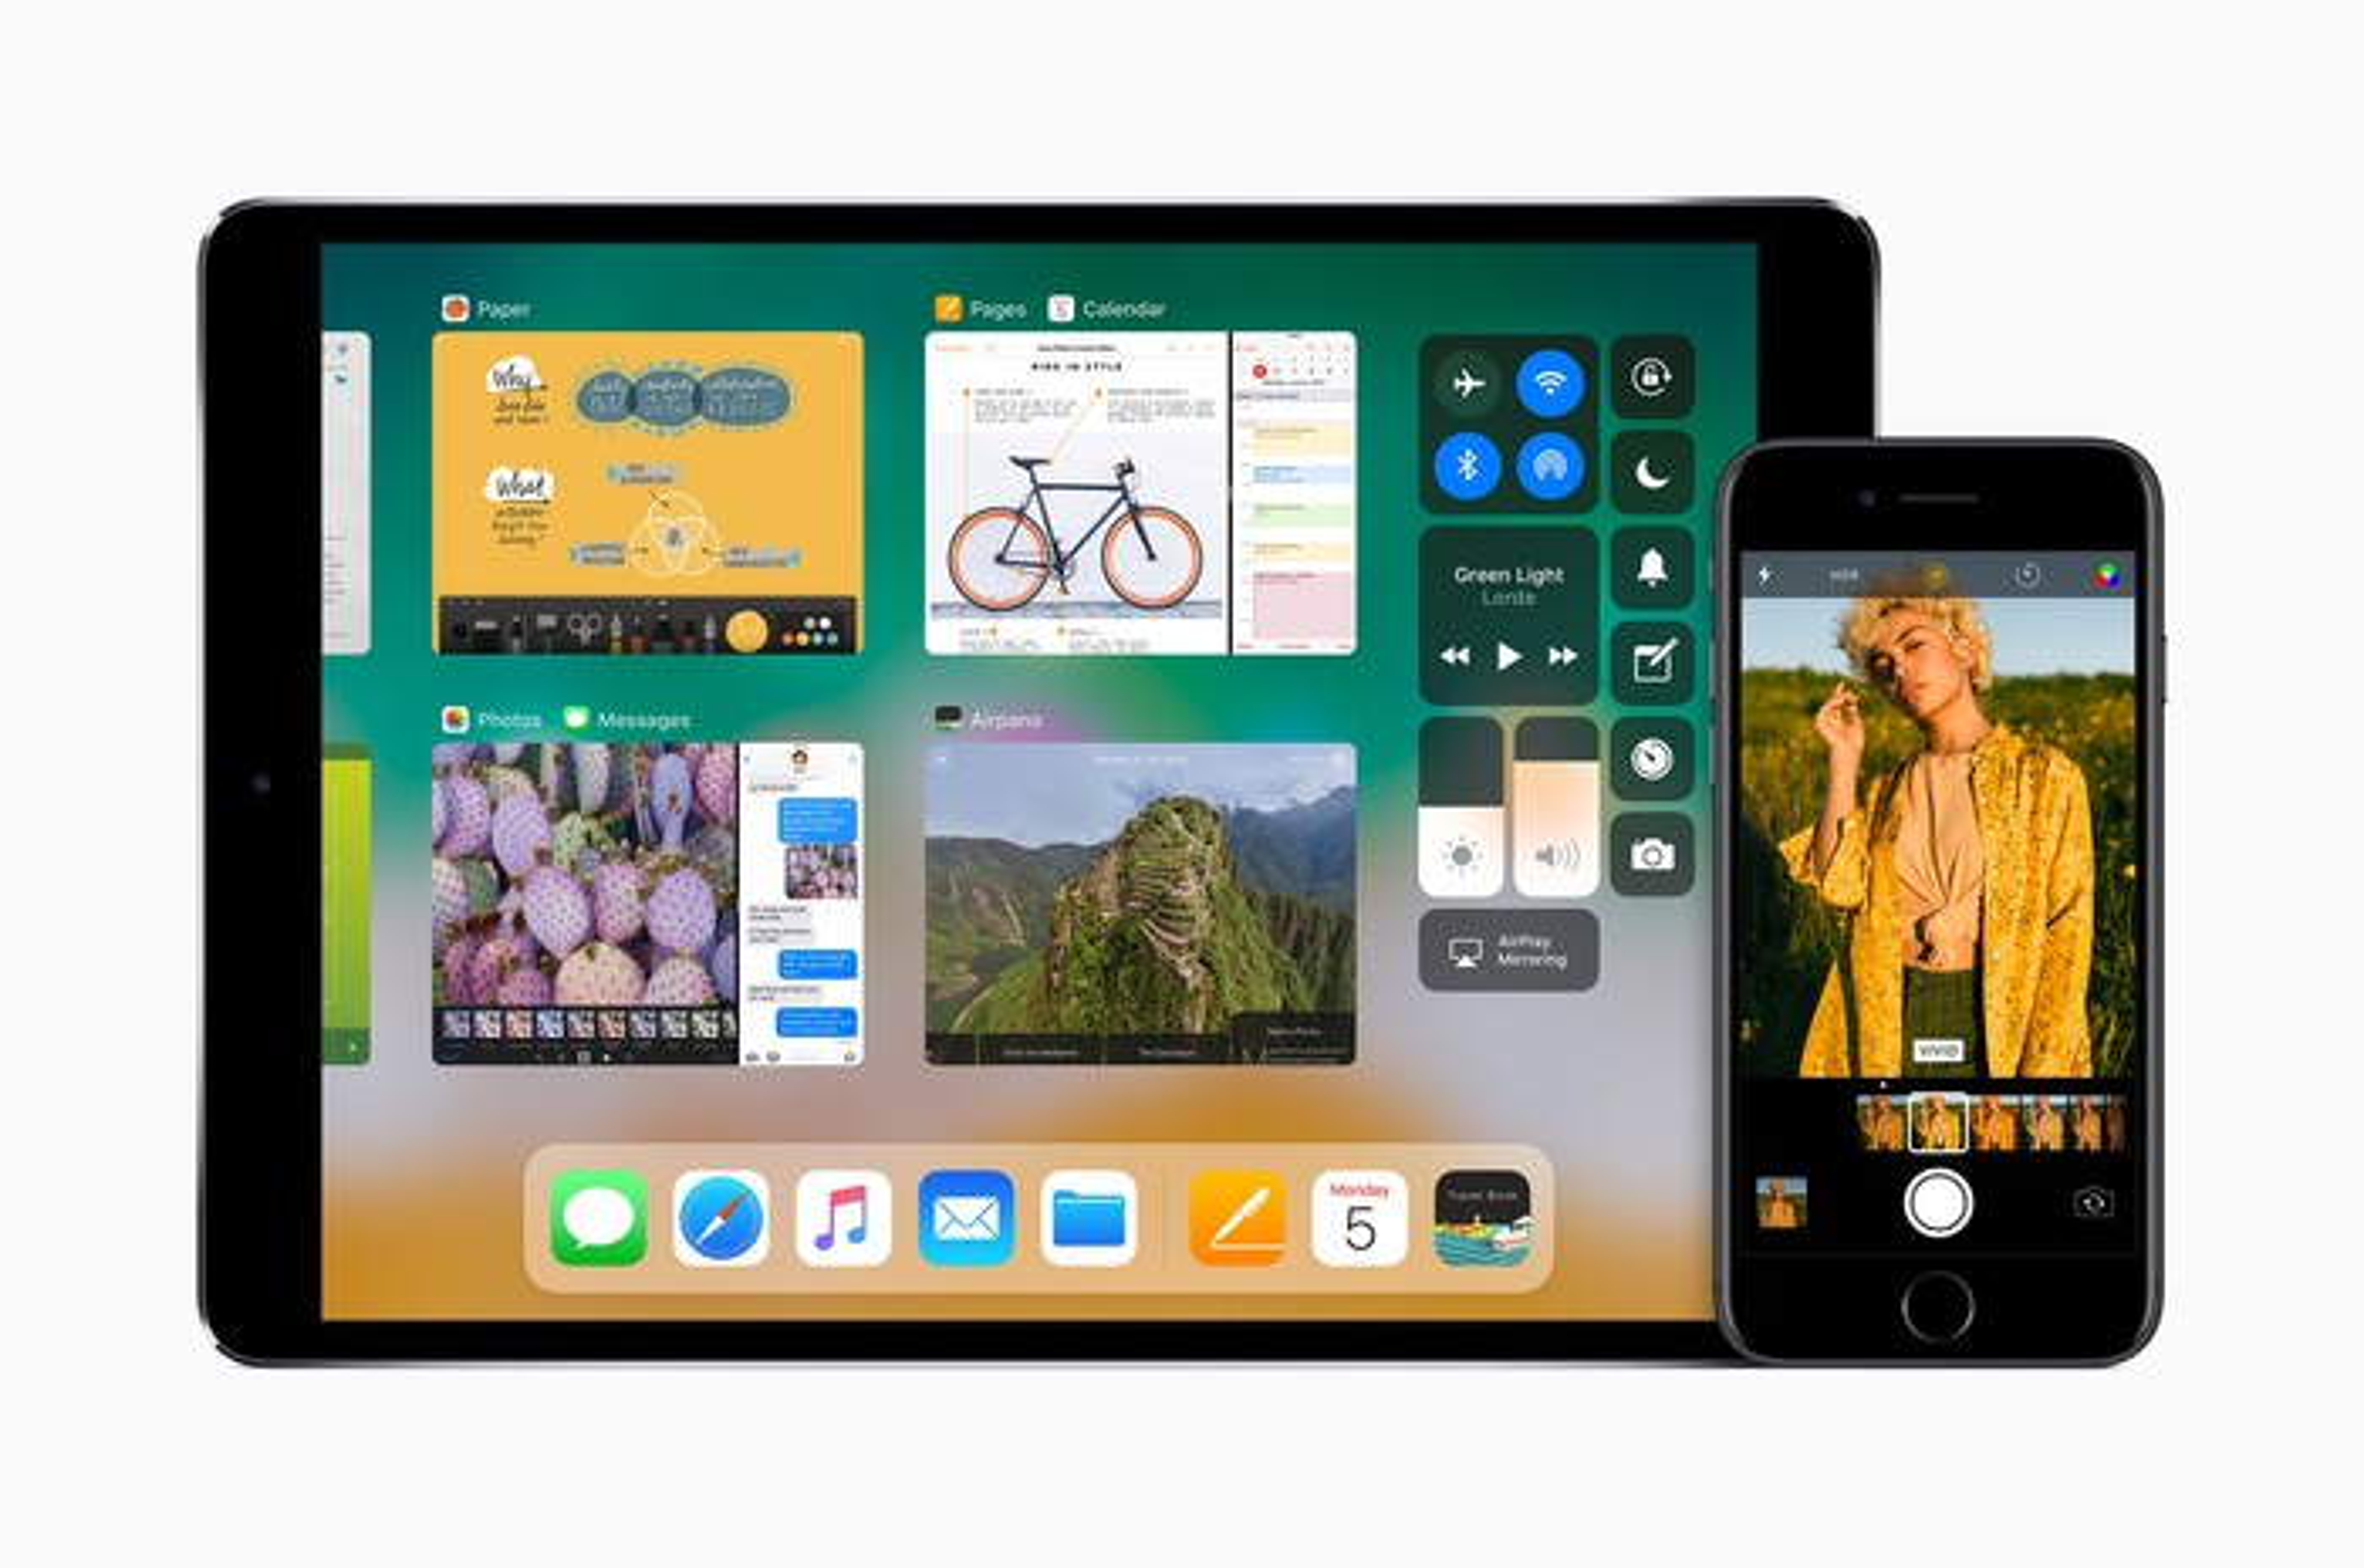 Apple's iPhone and iPad running iOS 11